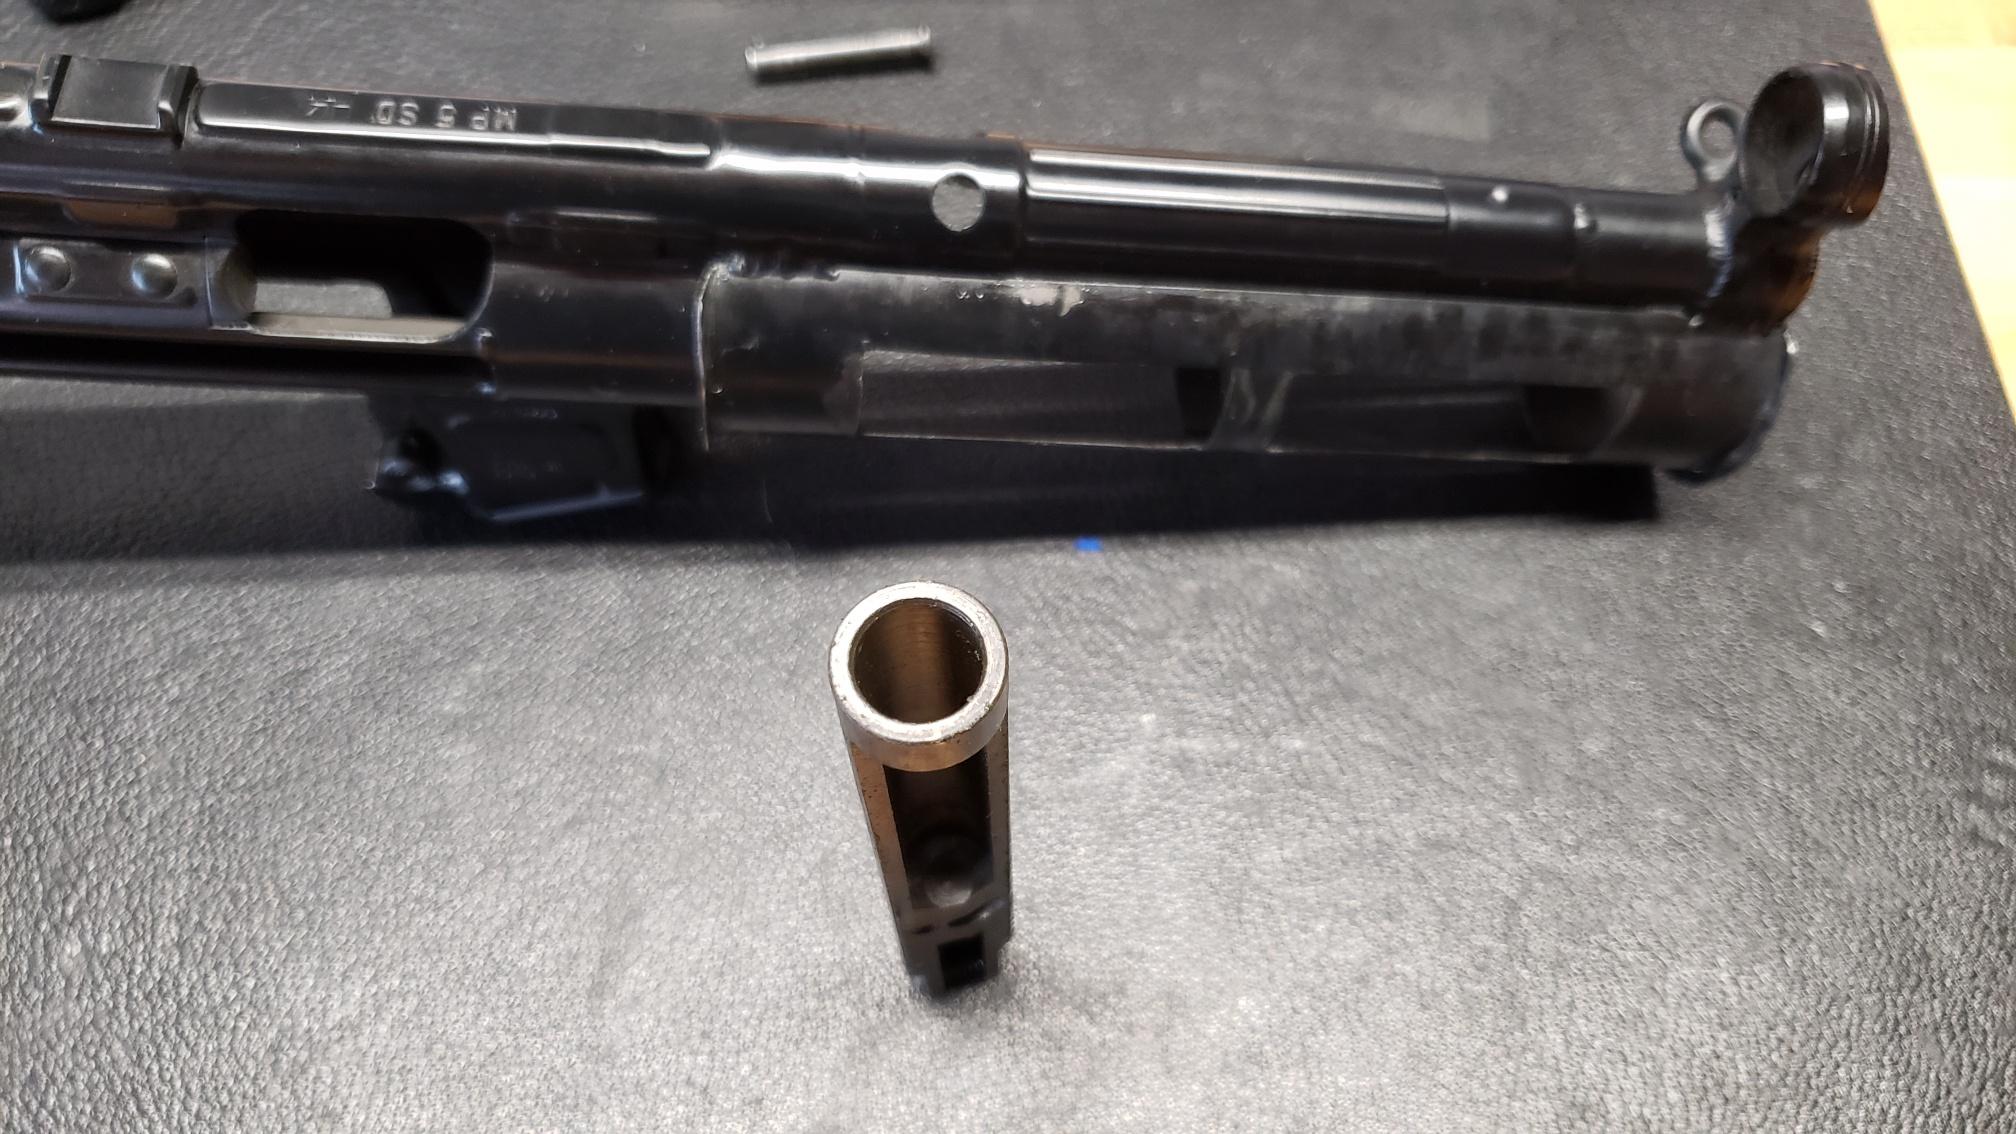 MP5 blues - broken carrier and stuck locking piece-20200616_113852_resized.jpg